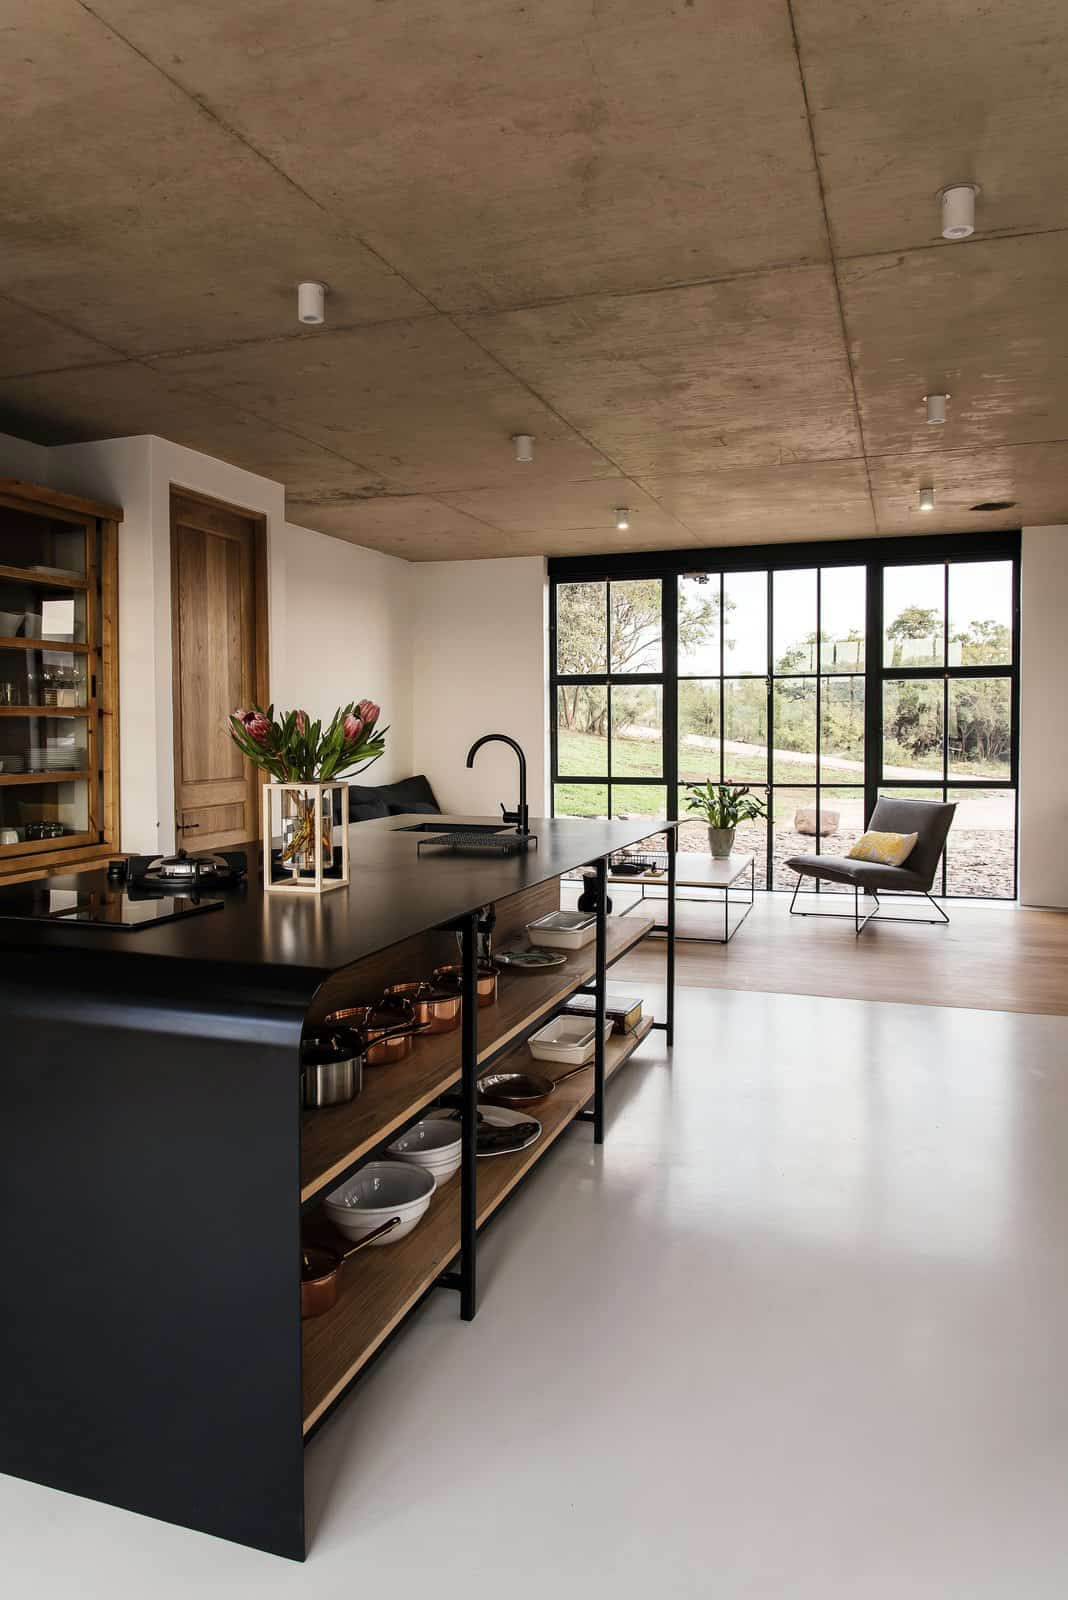 suvremena-seoska kuća-kuhinja